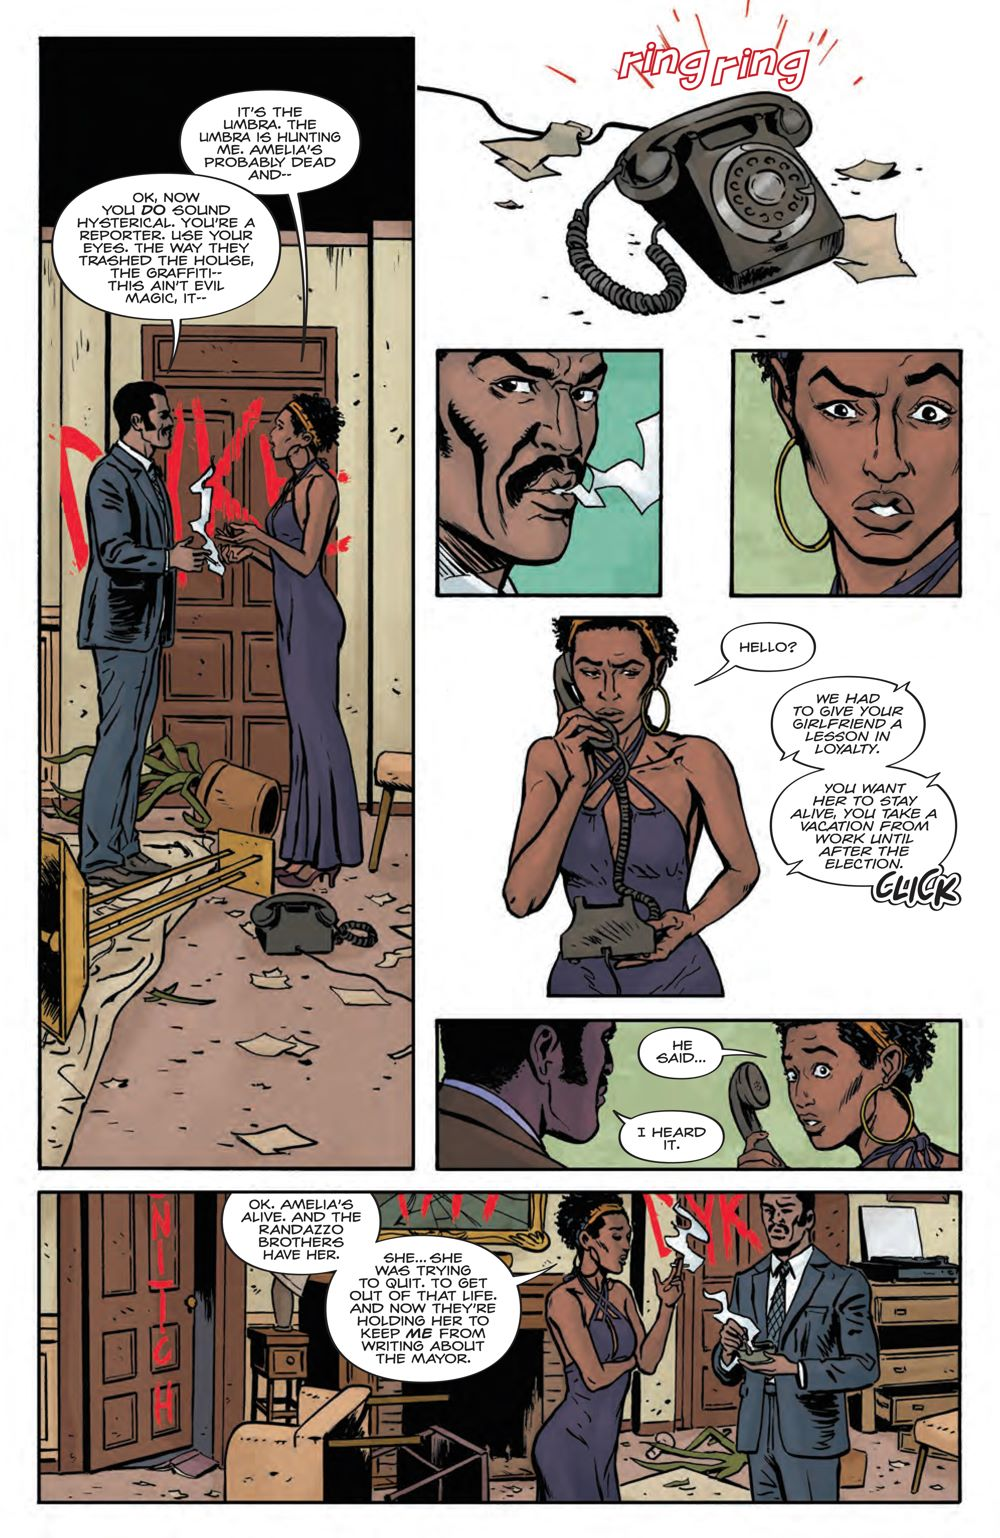 Abbott_1973_003_PRESS_5 ComicList Previews: ABBOTT 1973 #3 (OF 5)